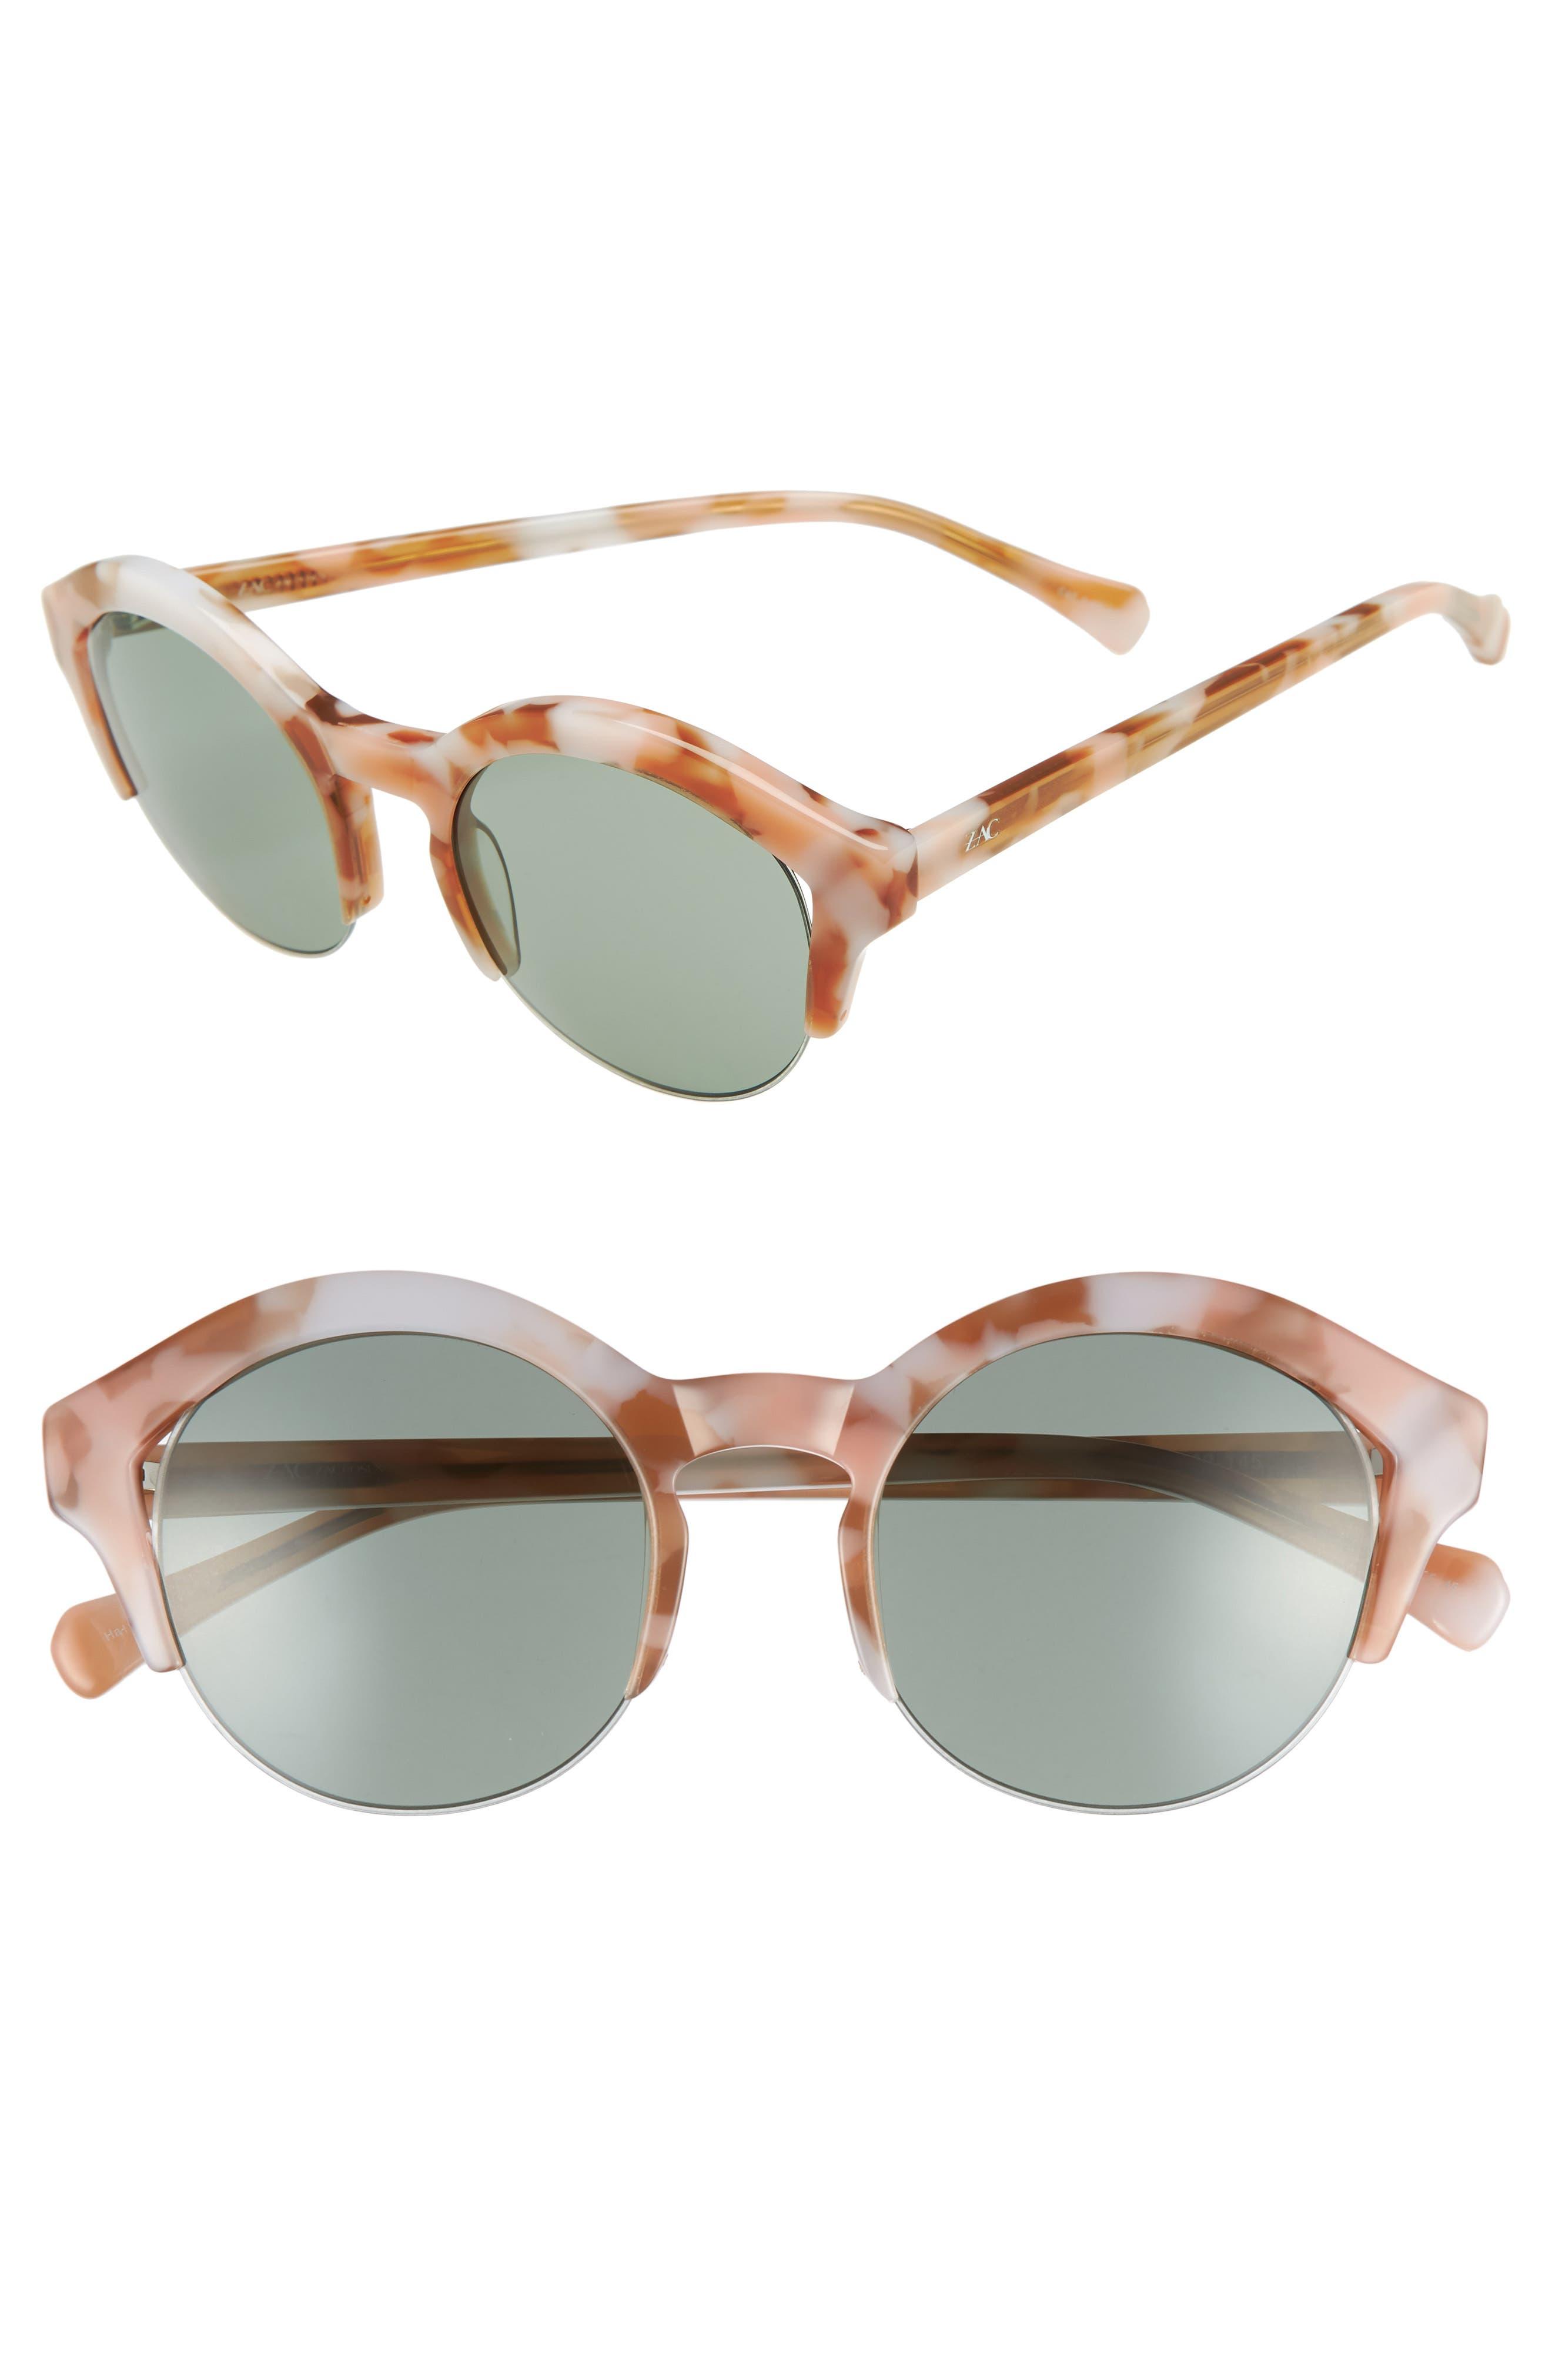 Bren 51mm Half-Rim Sunglasses,                         Main,                         color, Pink/ Tortoise Green